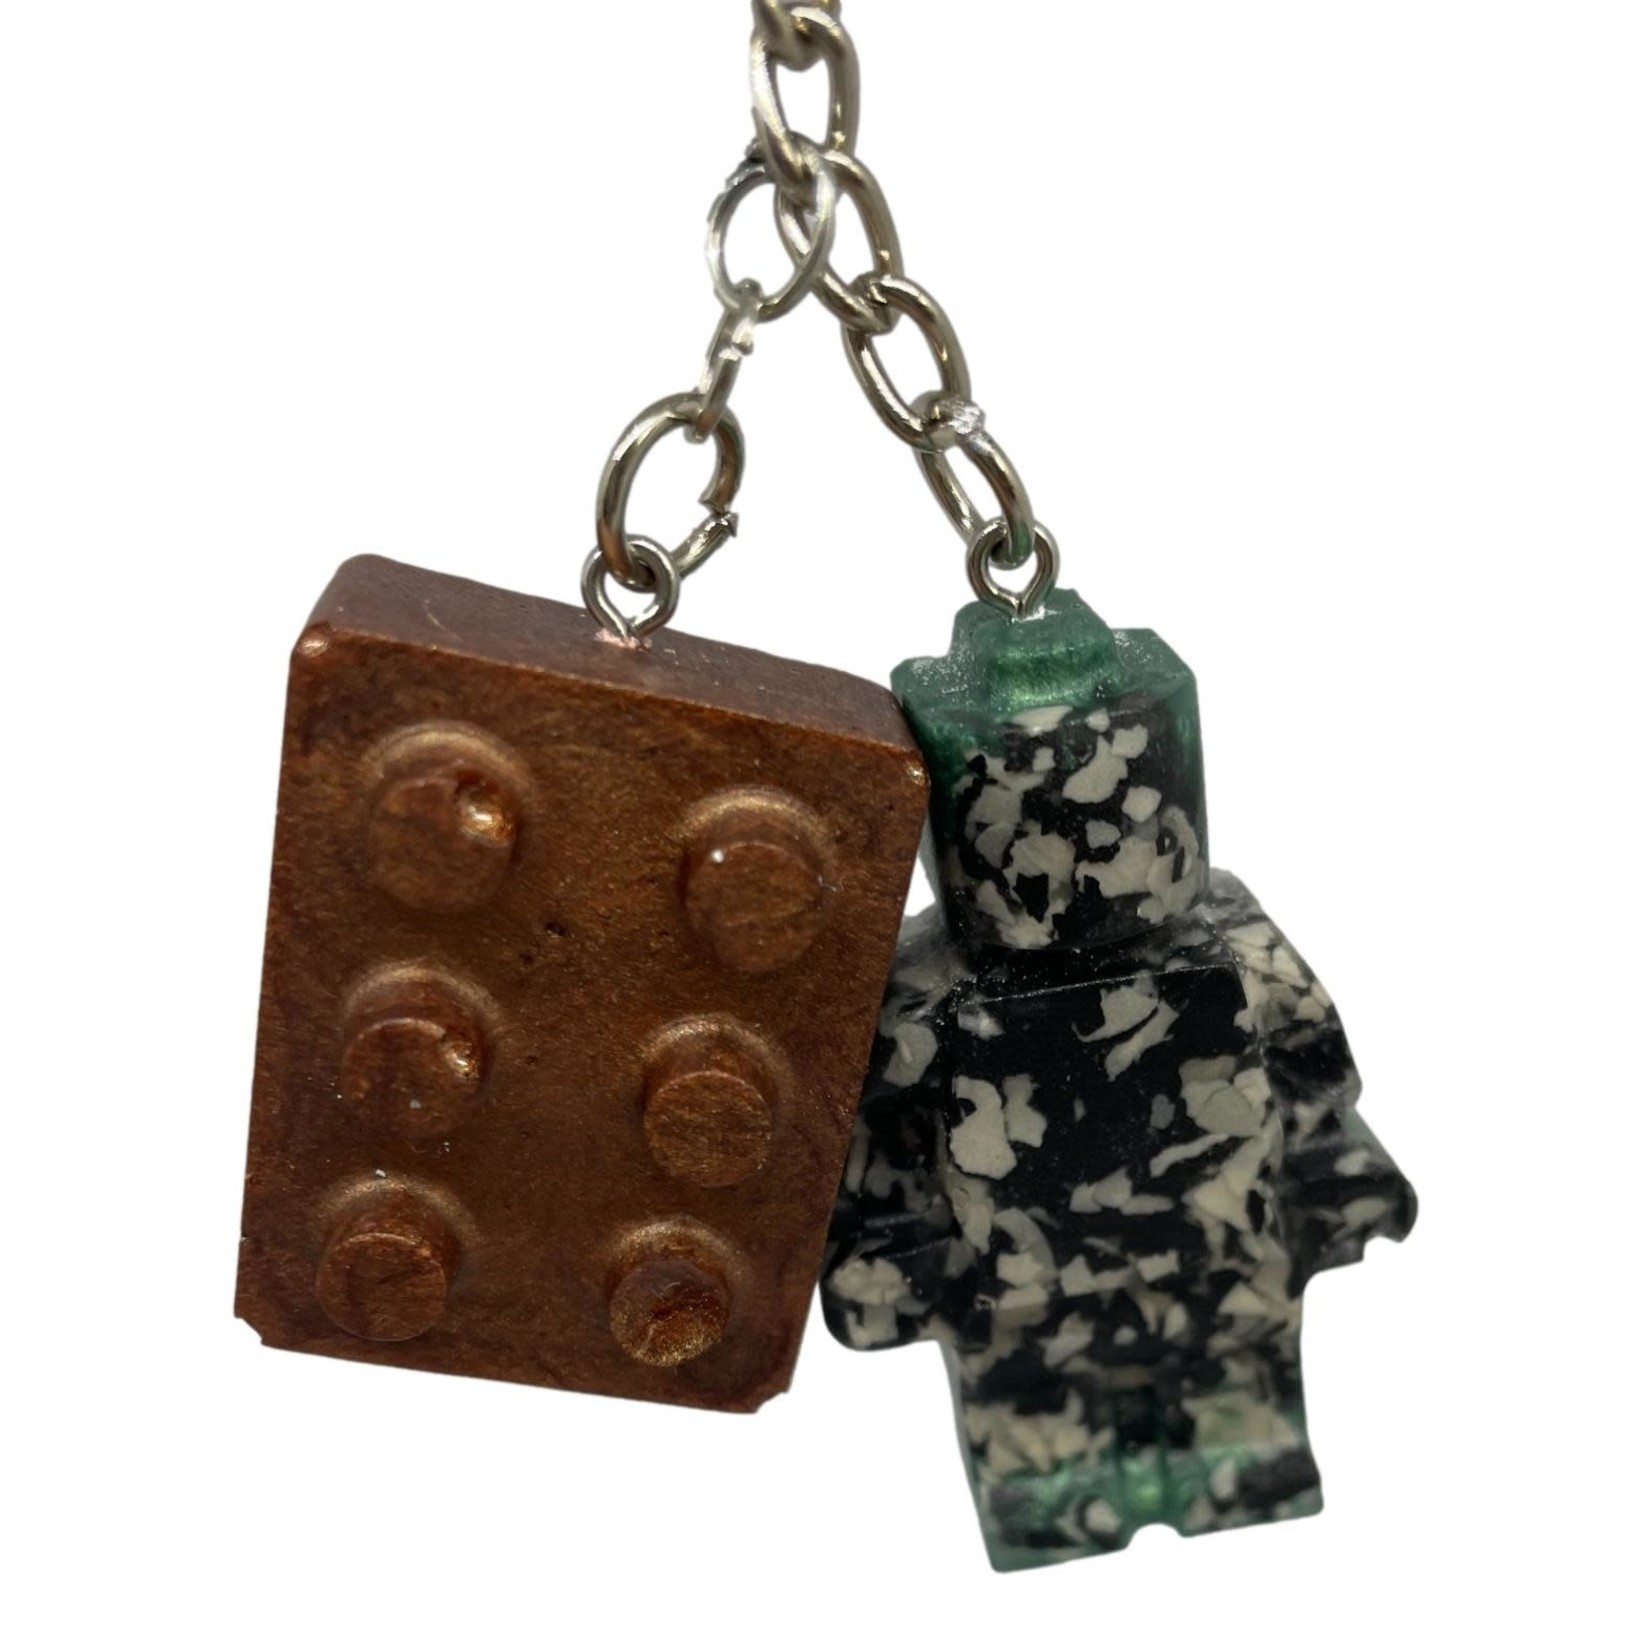 East Coast Sirens Camo Lego Man Key Chain